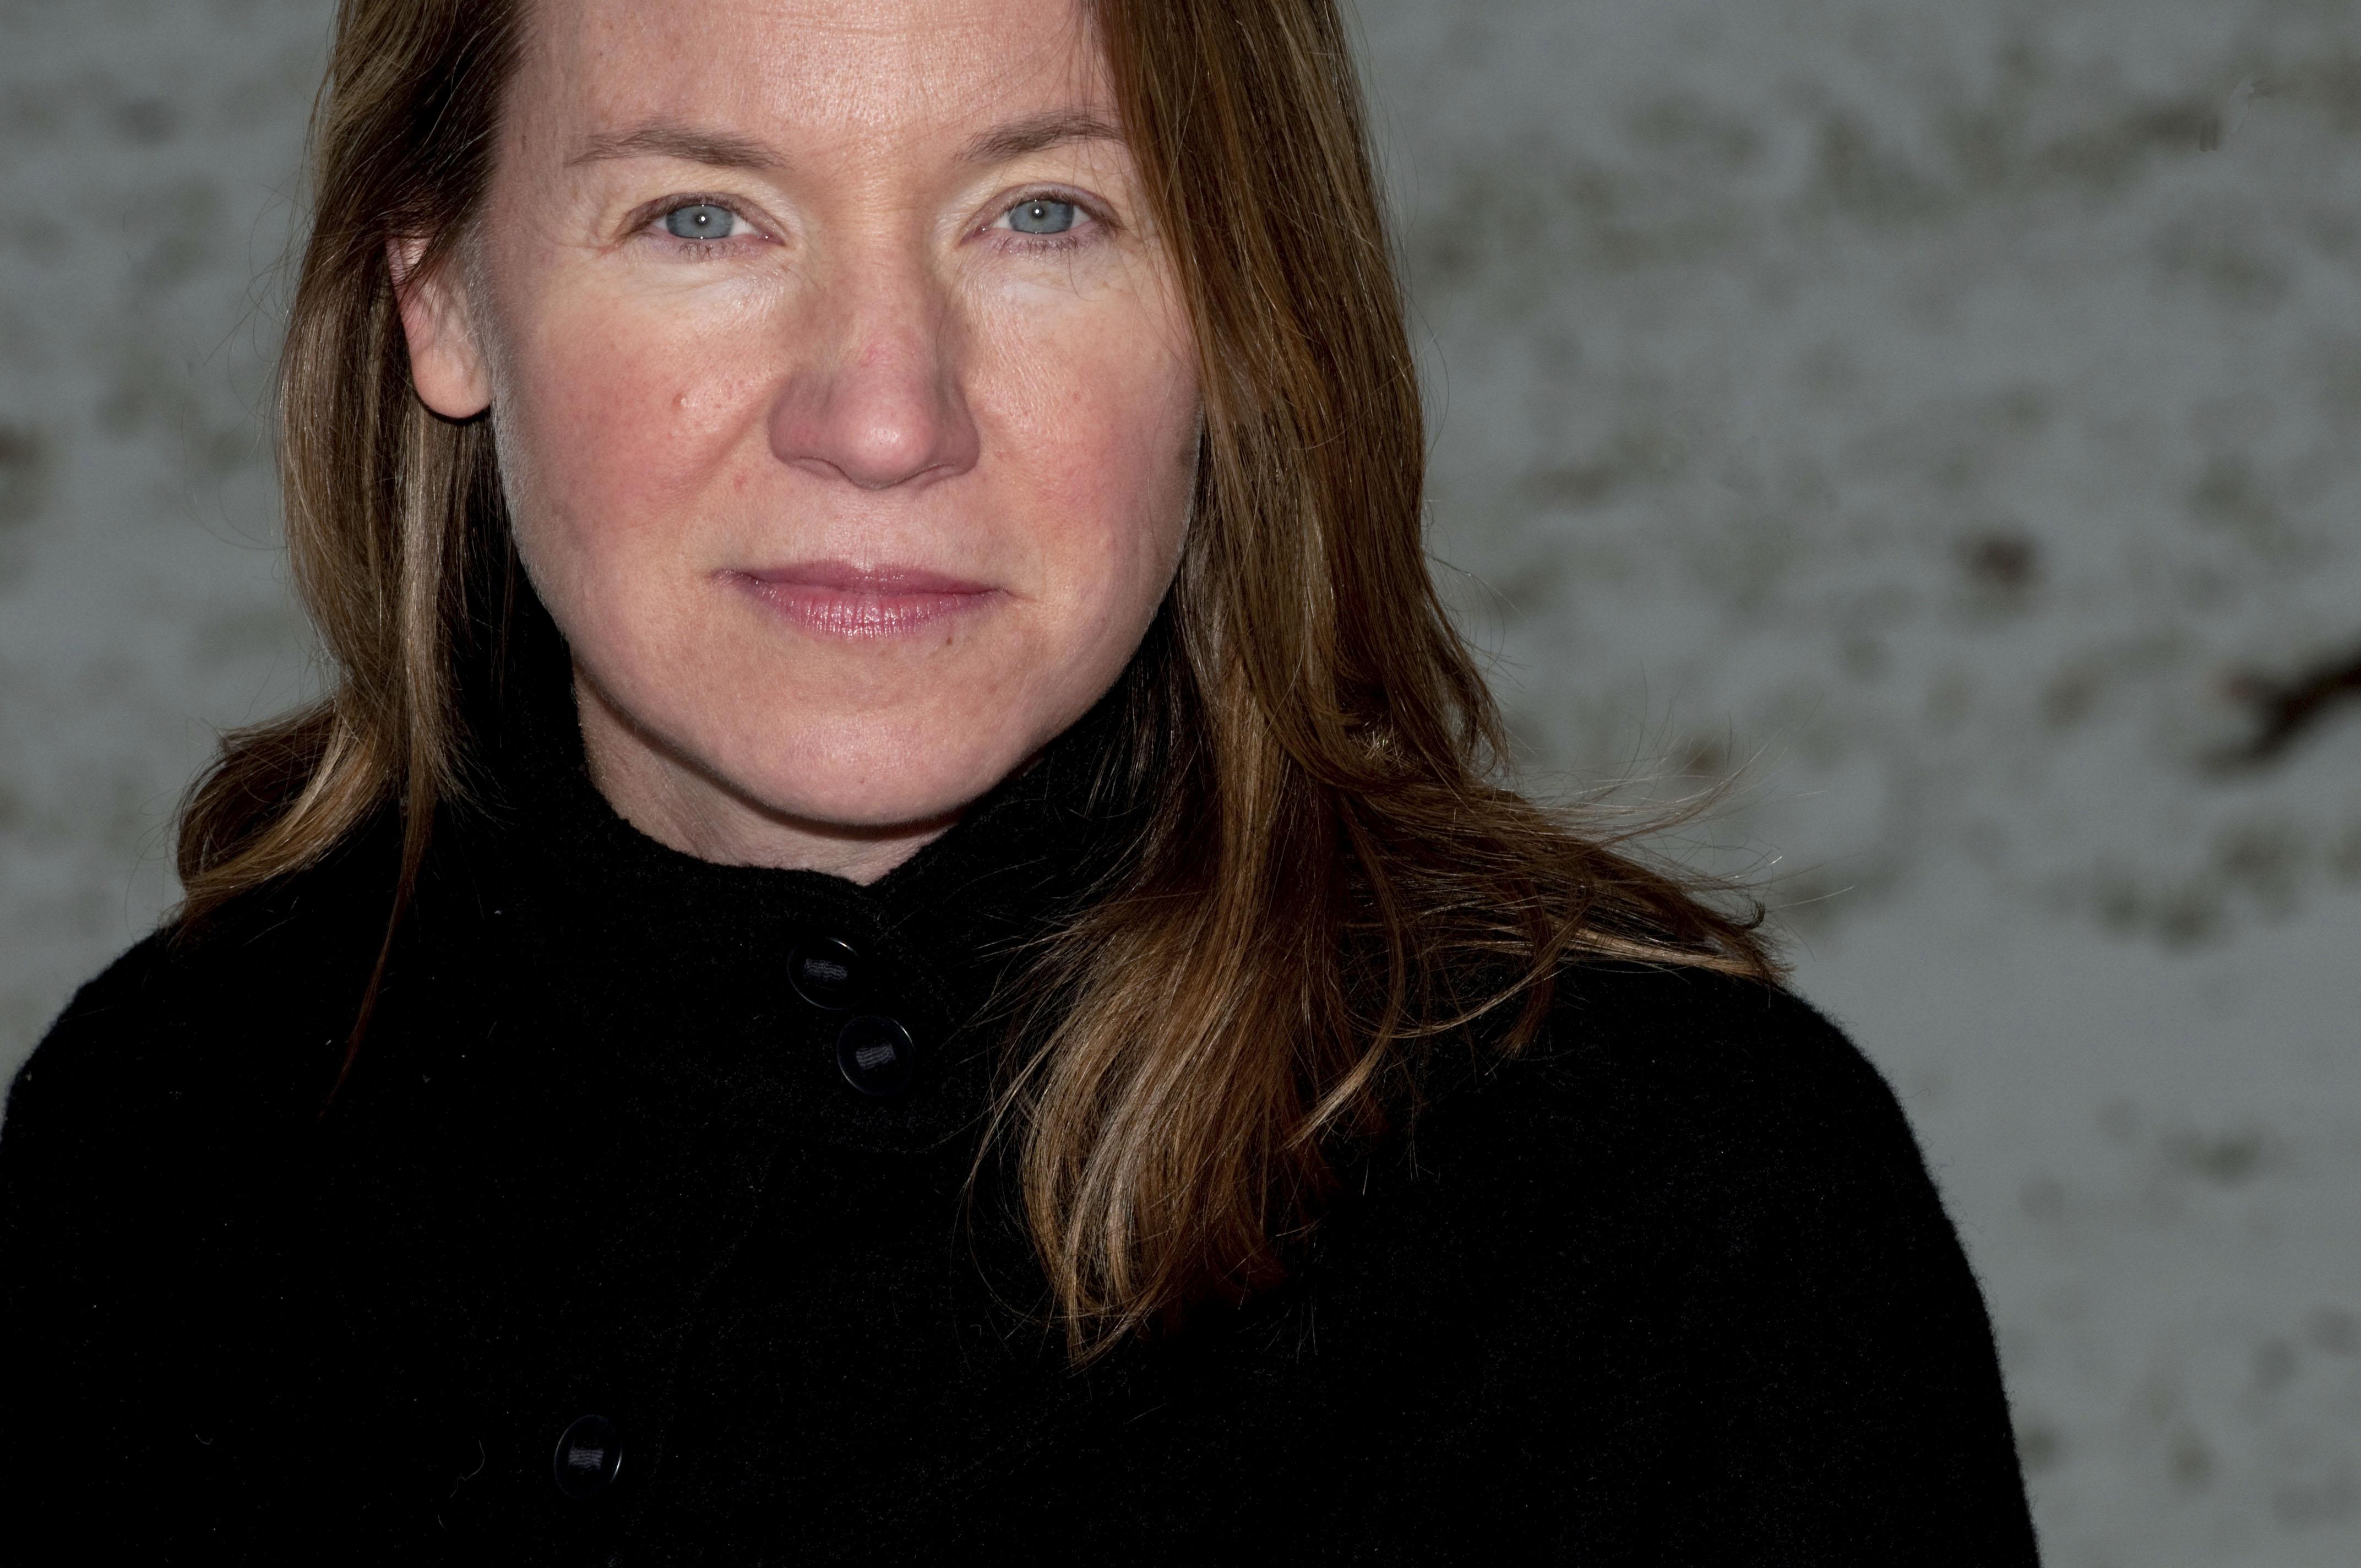 2012 author photograph of Sarah Stewart Taylor. (Photo by Jennifer Hauck)